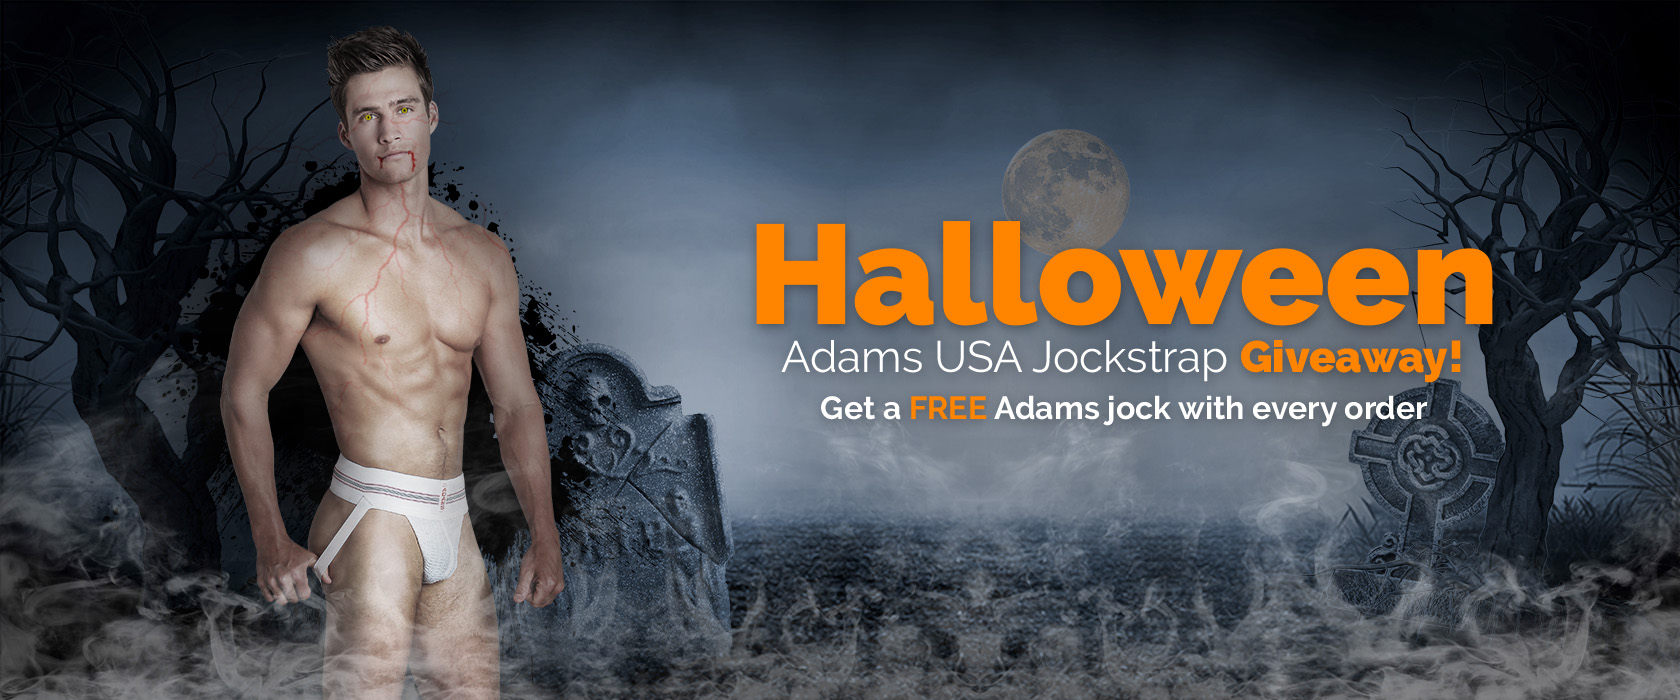 international-jock-halloween-adams-jock-giveaway